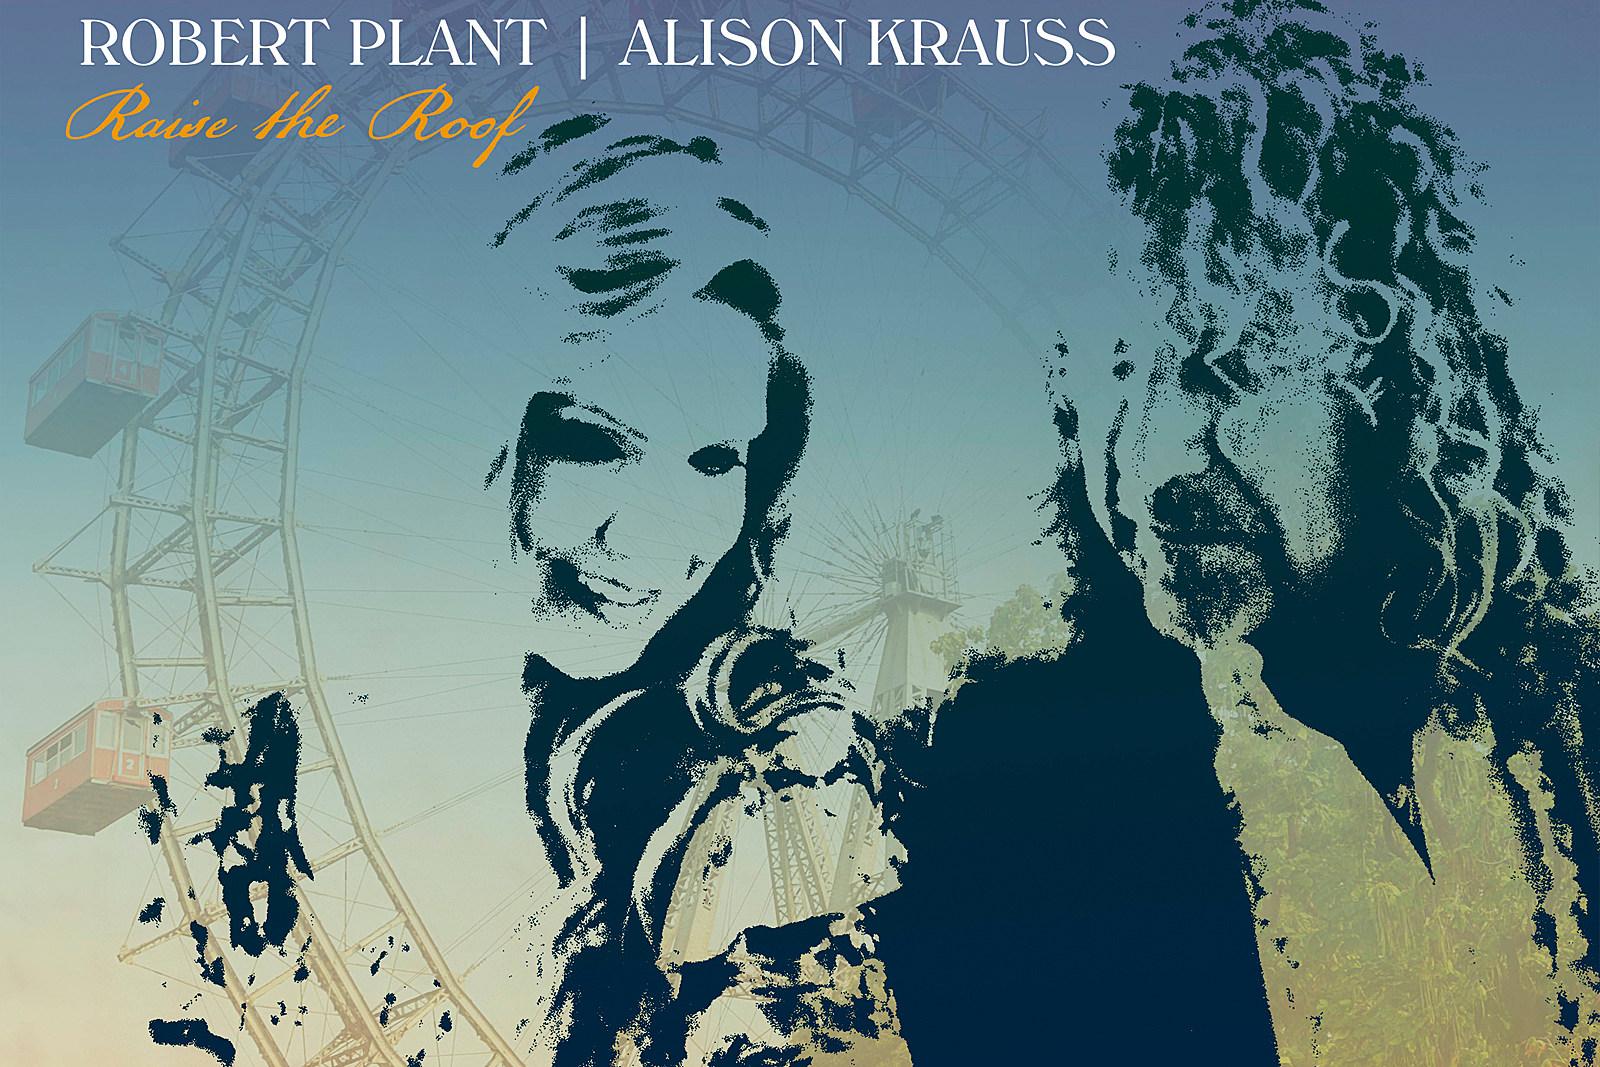 Robert Plant and Alison Krauss Reunite for 'Raise the Roof' Album